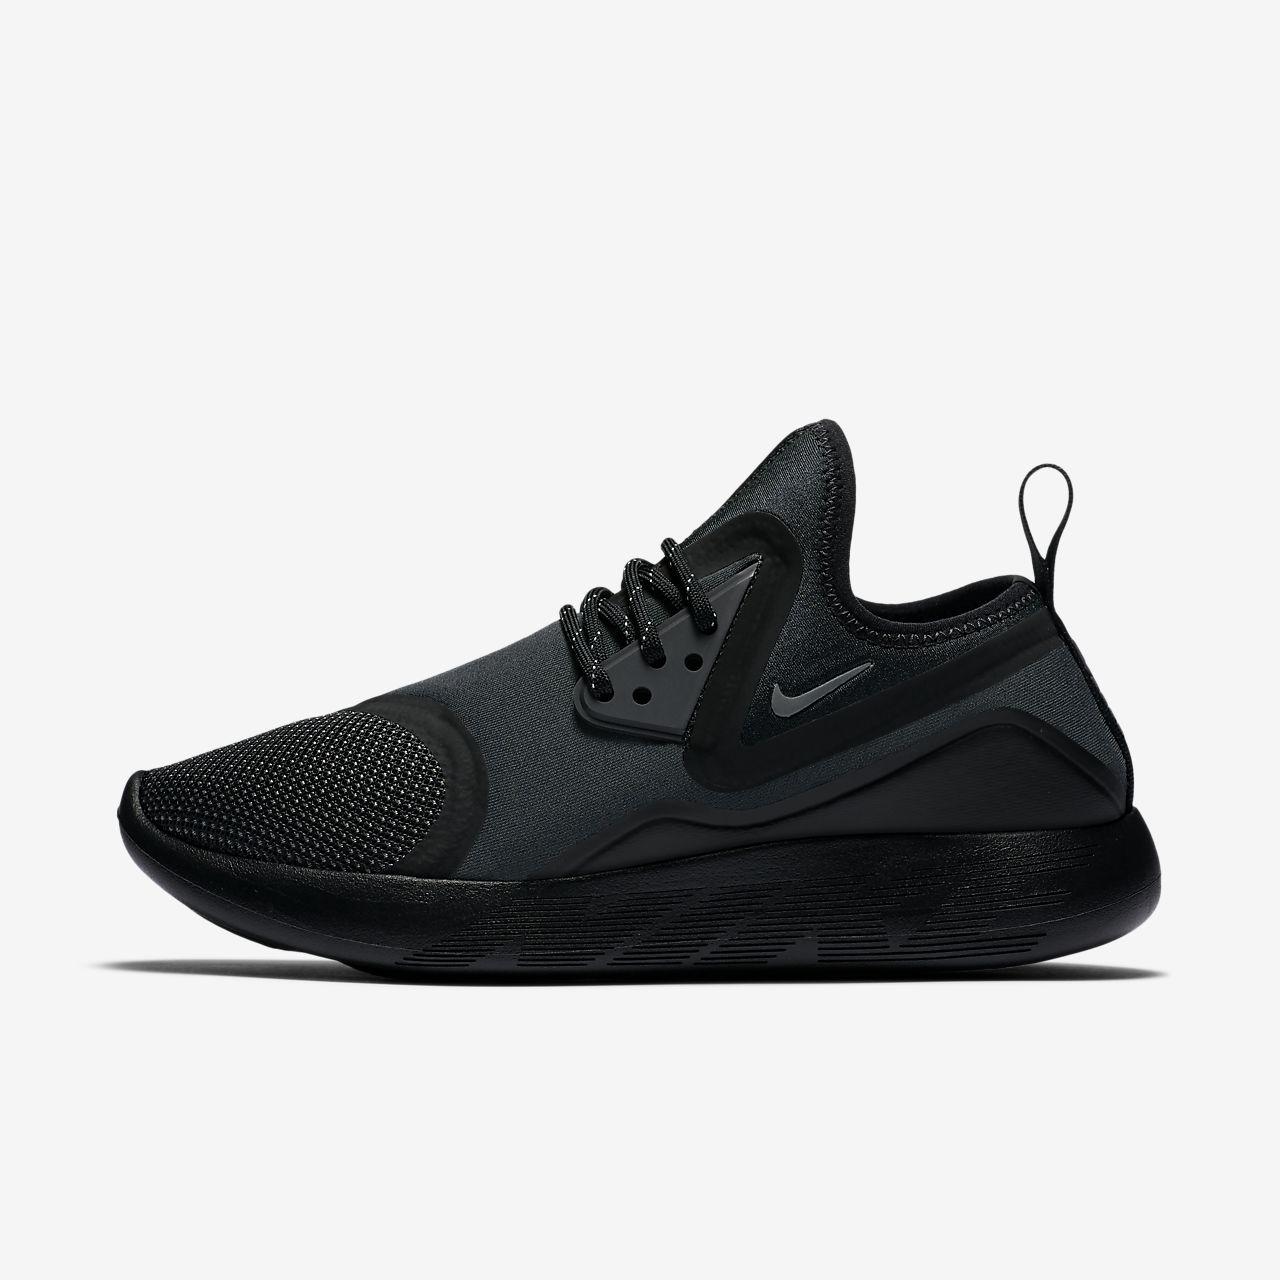 ... Nike LunarCharge Essential Damen-Laufschuh